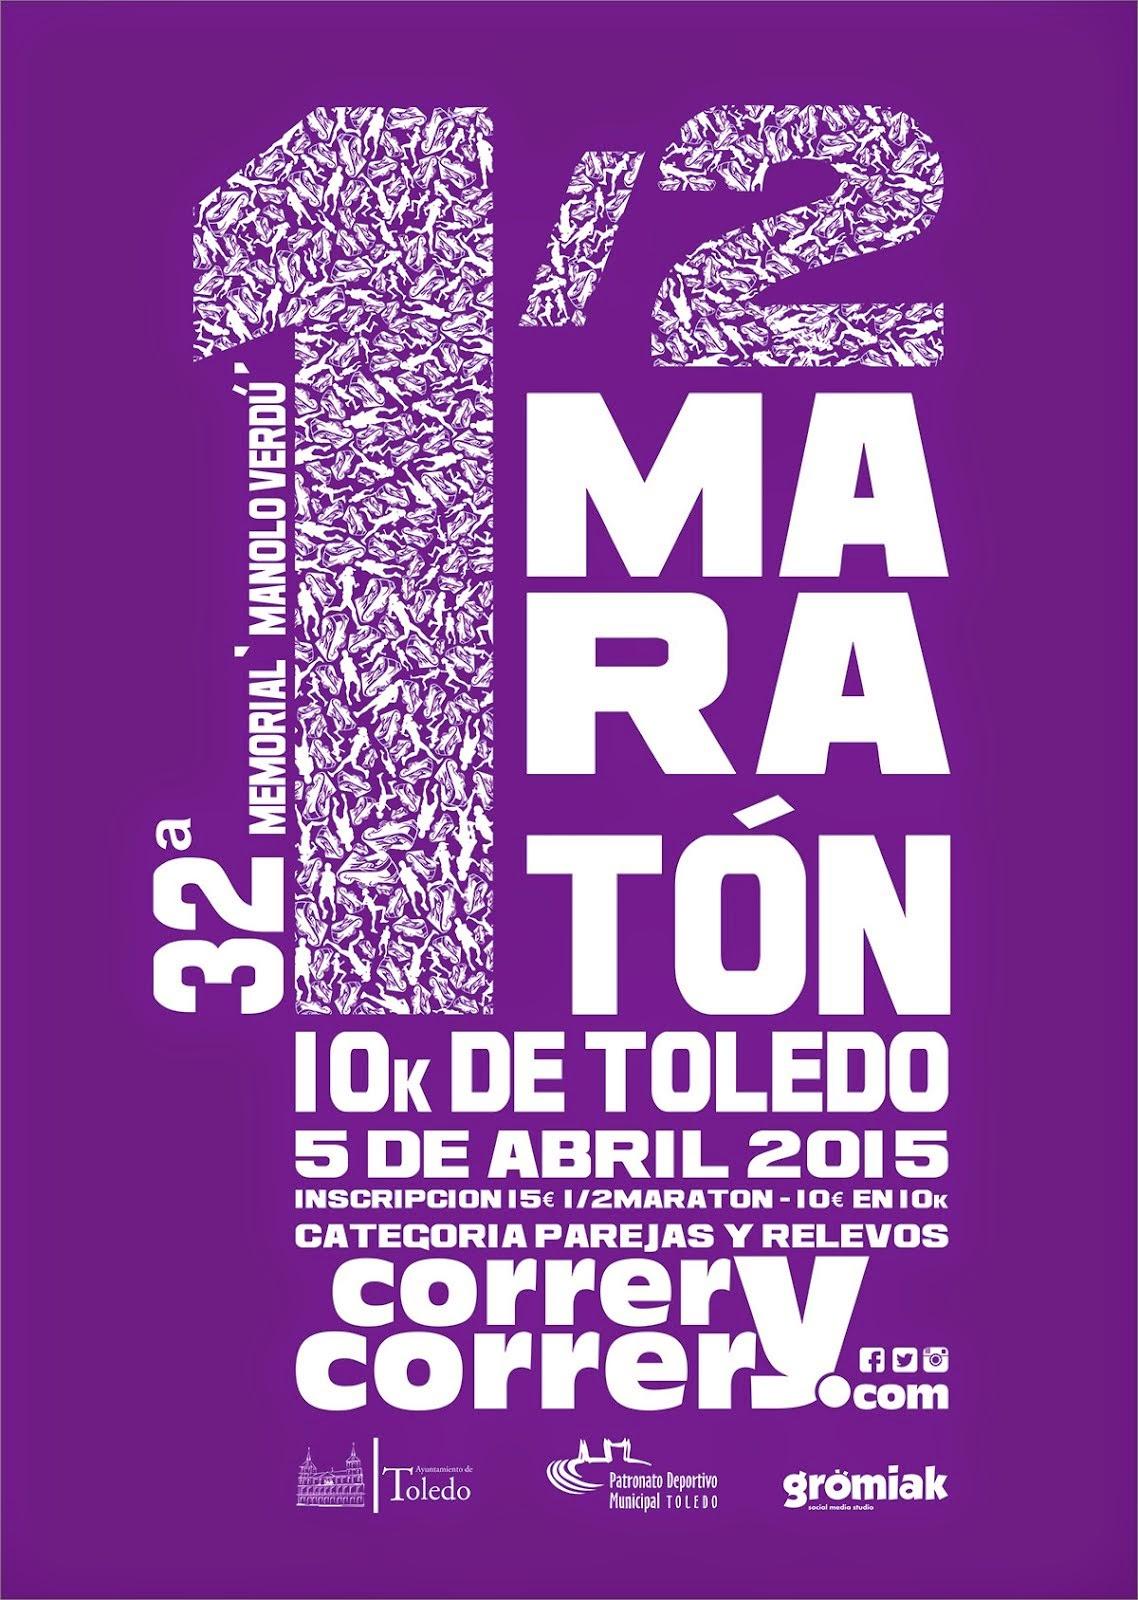 32ª Media Maratón y 10 Km de Toledo